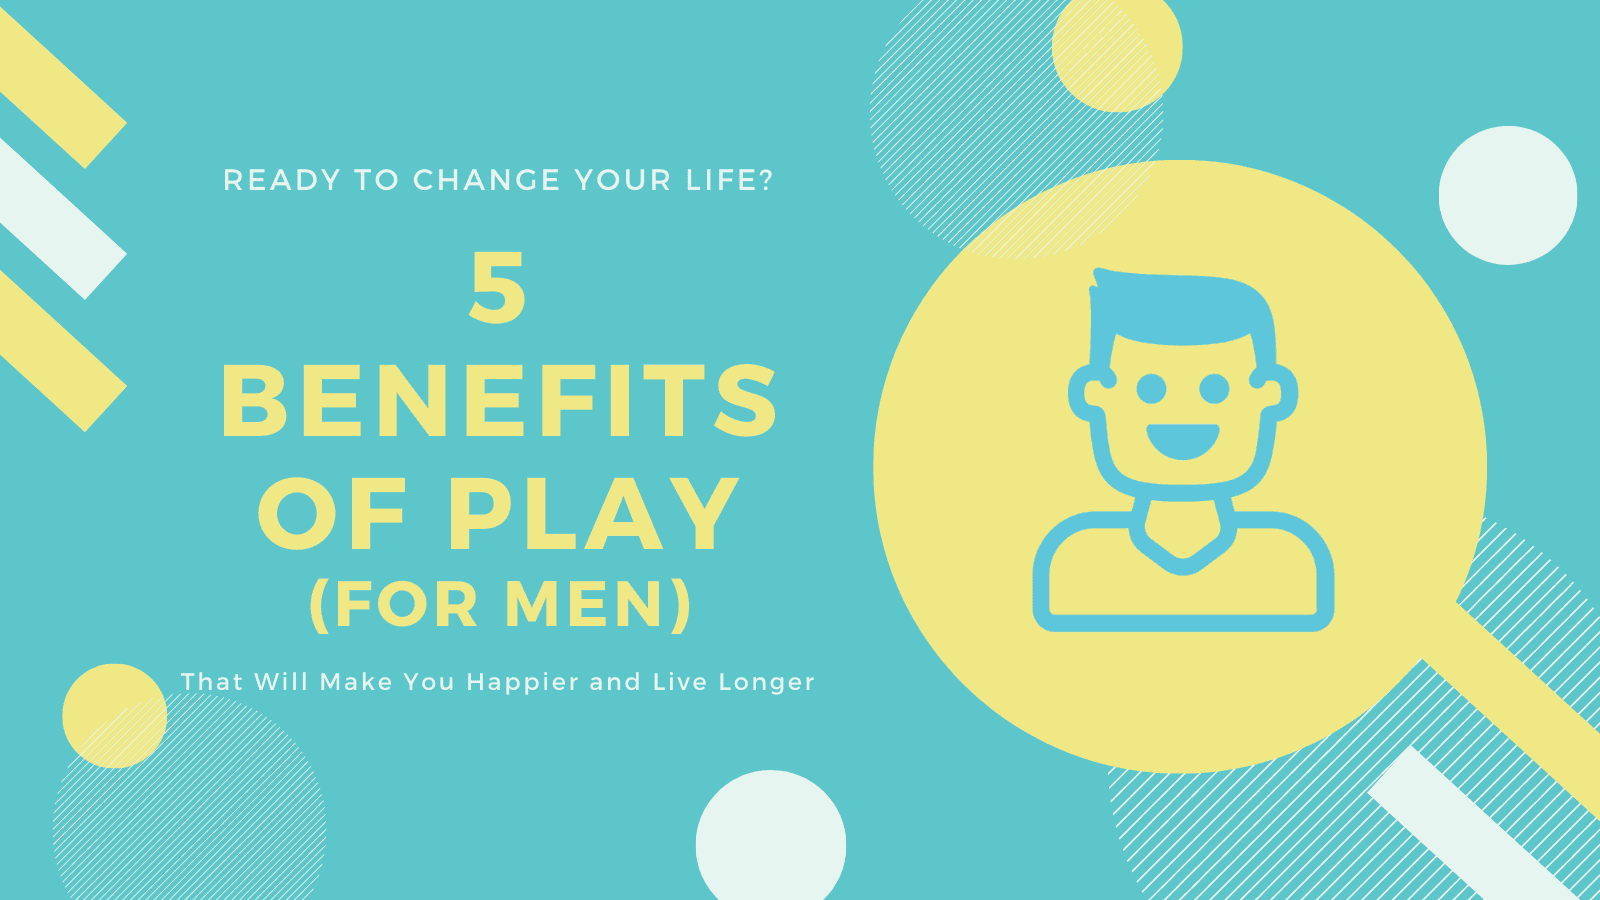 Dudefluencer: 5 Benefits of Play